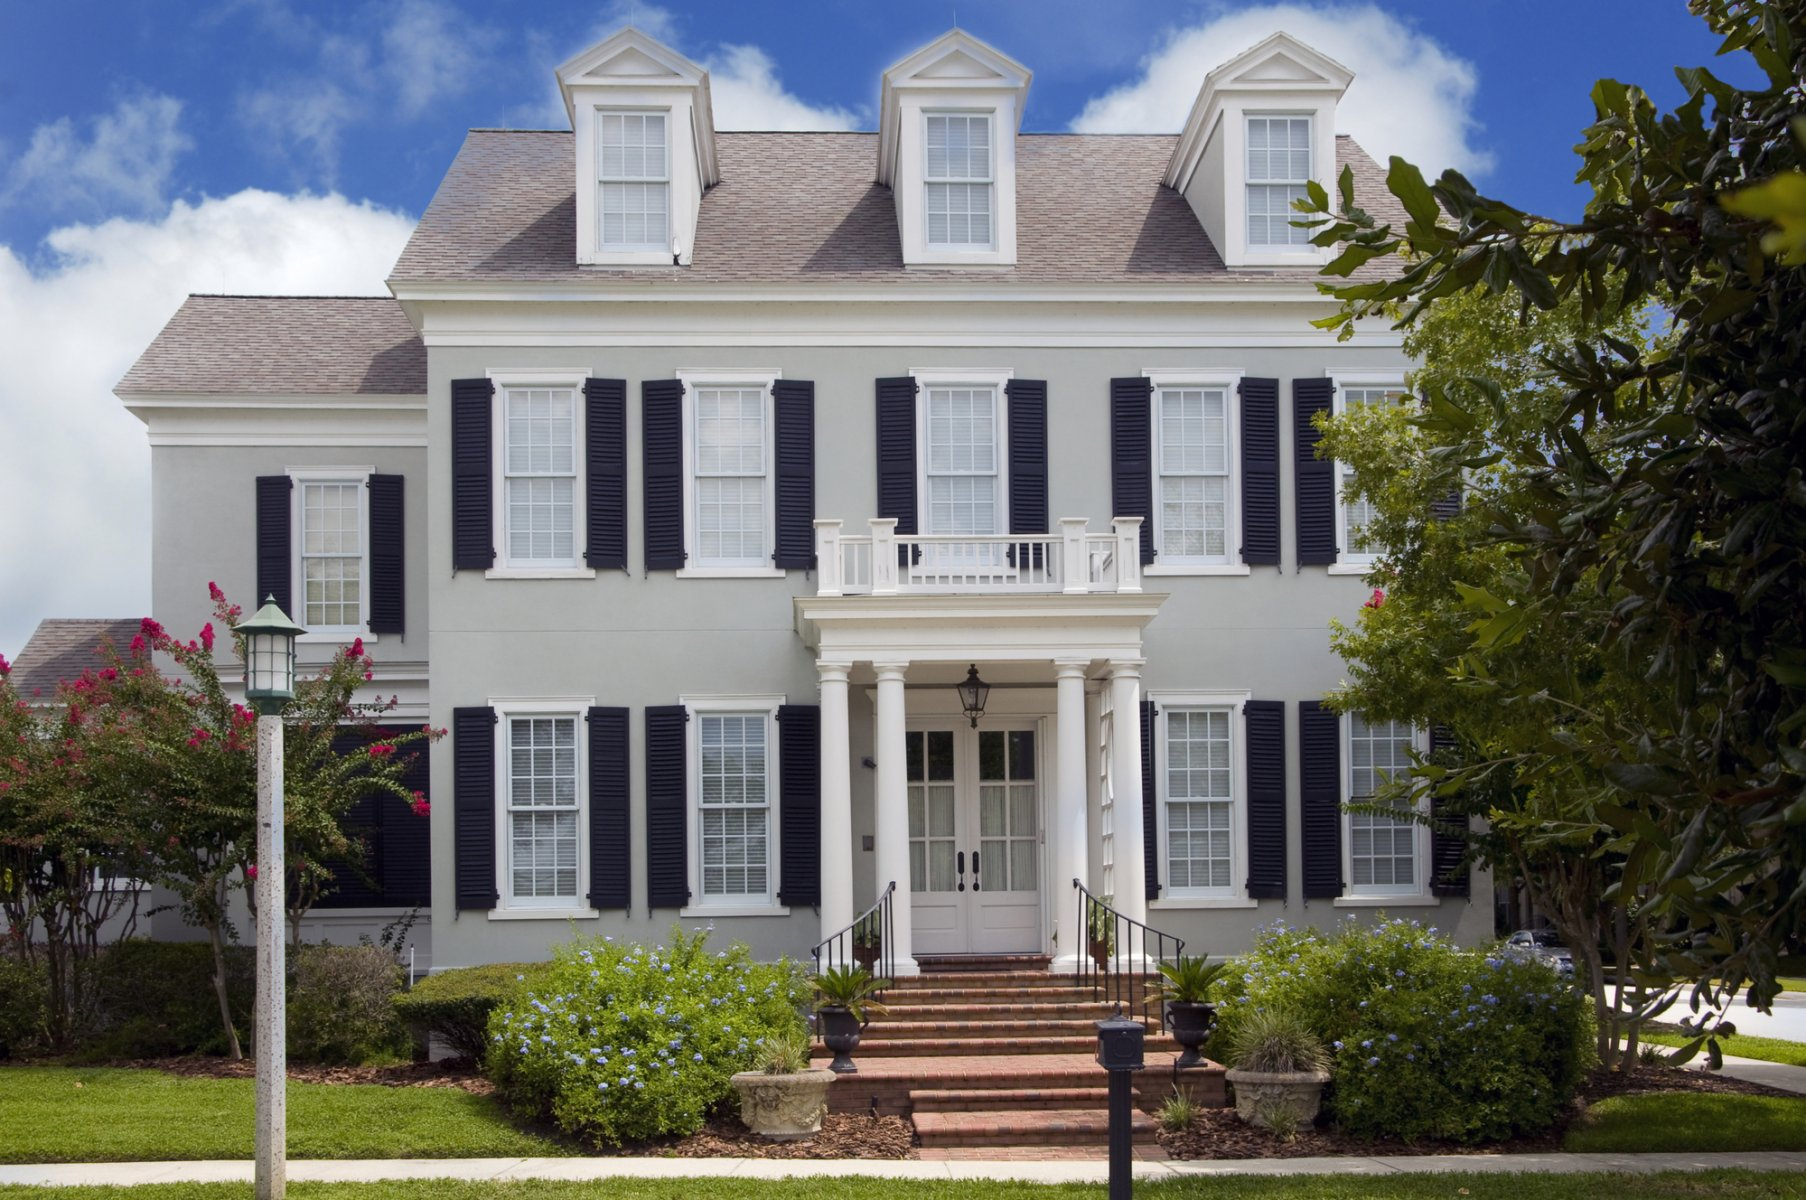 top real estate agents prince william county manassas bristow gainesville va jennie cournoyer. Black Bedroom Furniture Sets. Home Design Ideas